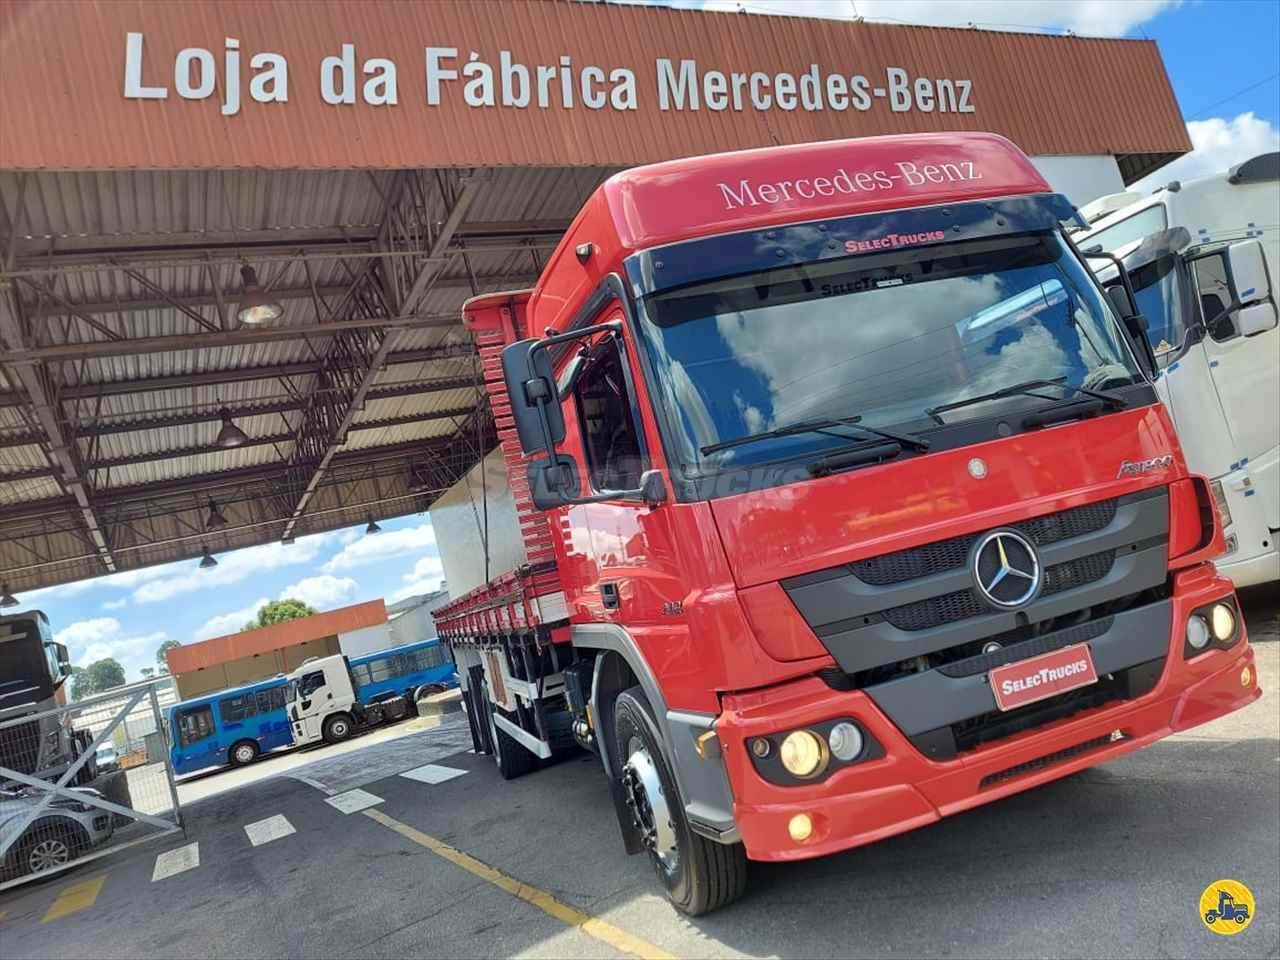 CAMINHAO MERCEDES-BENZ MB 2426 Carga Seca Truck 6x2 SelecTrucks - Betim MG BETIM MINAS GERAIS MG